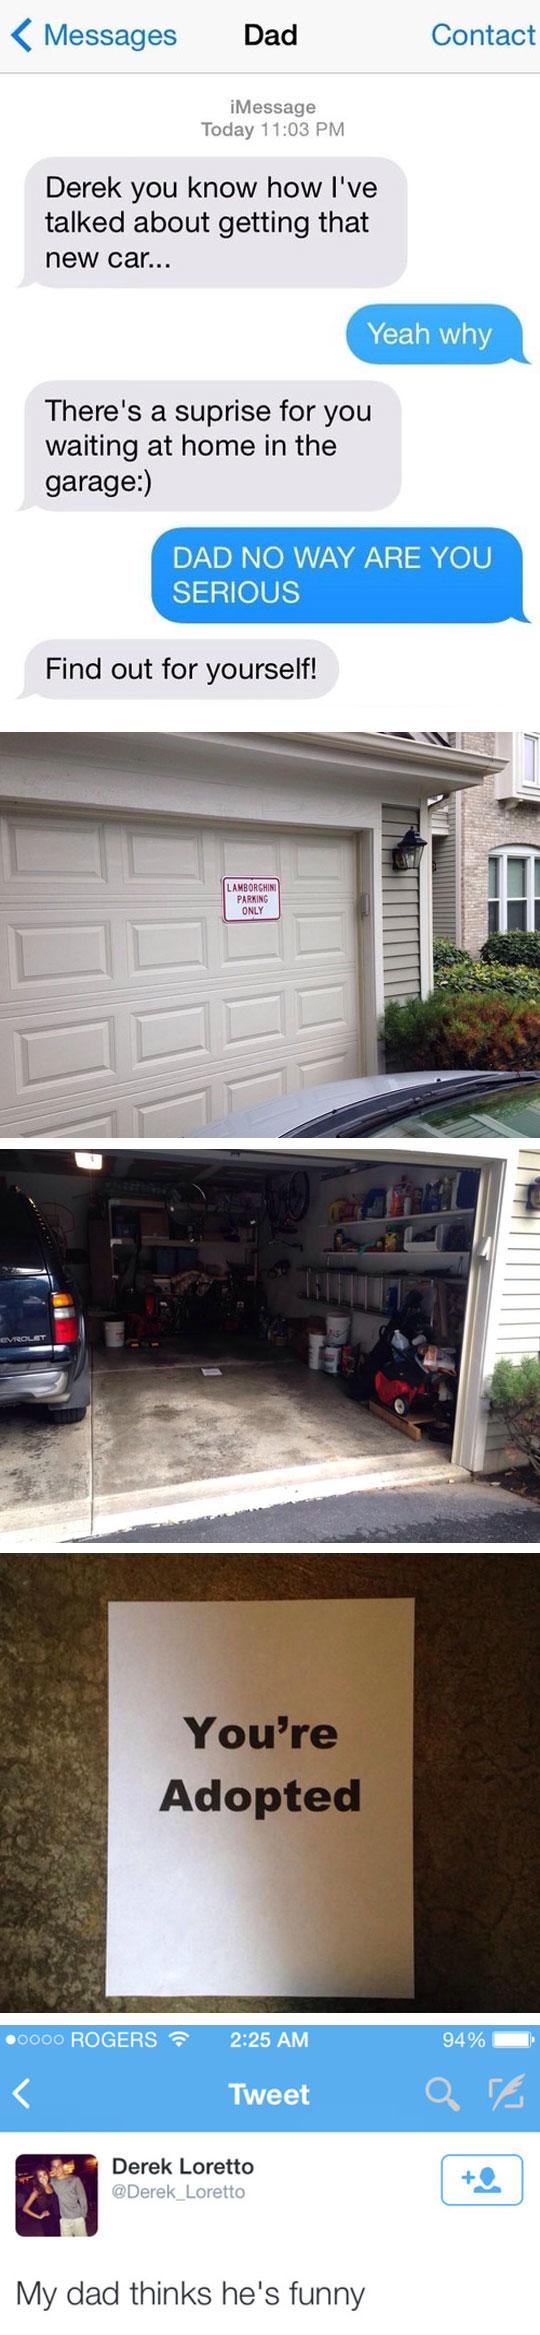 cool-dad-new-car-prank